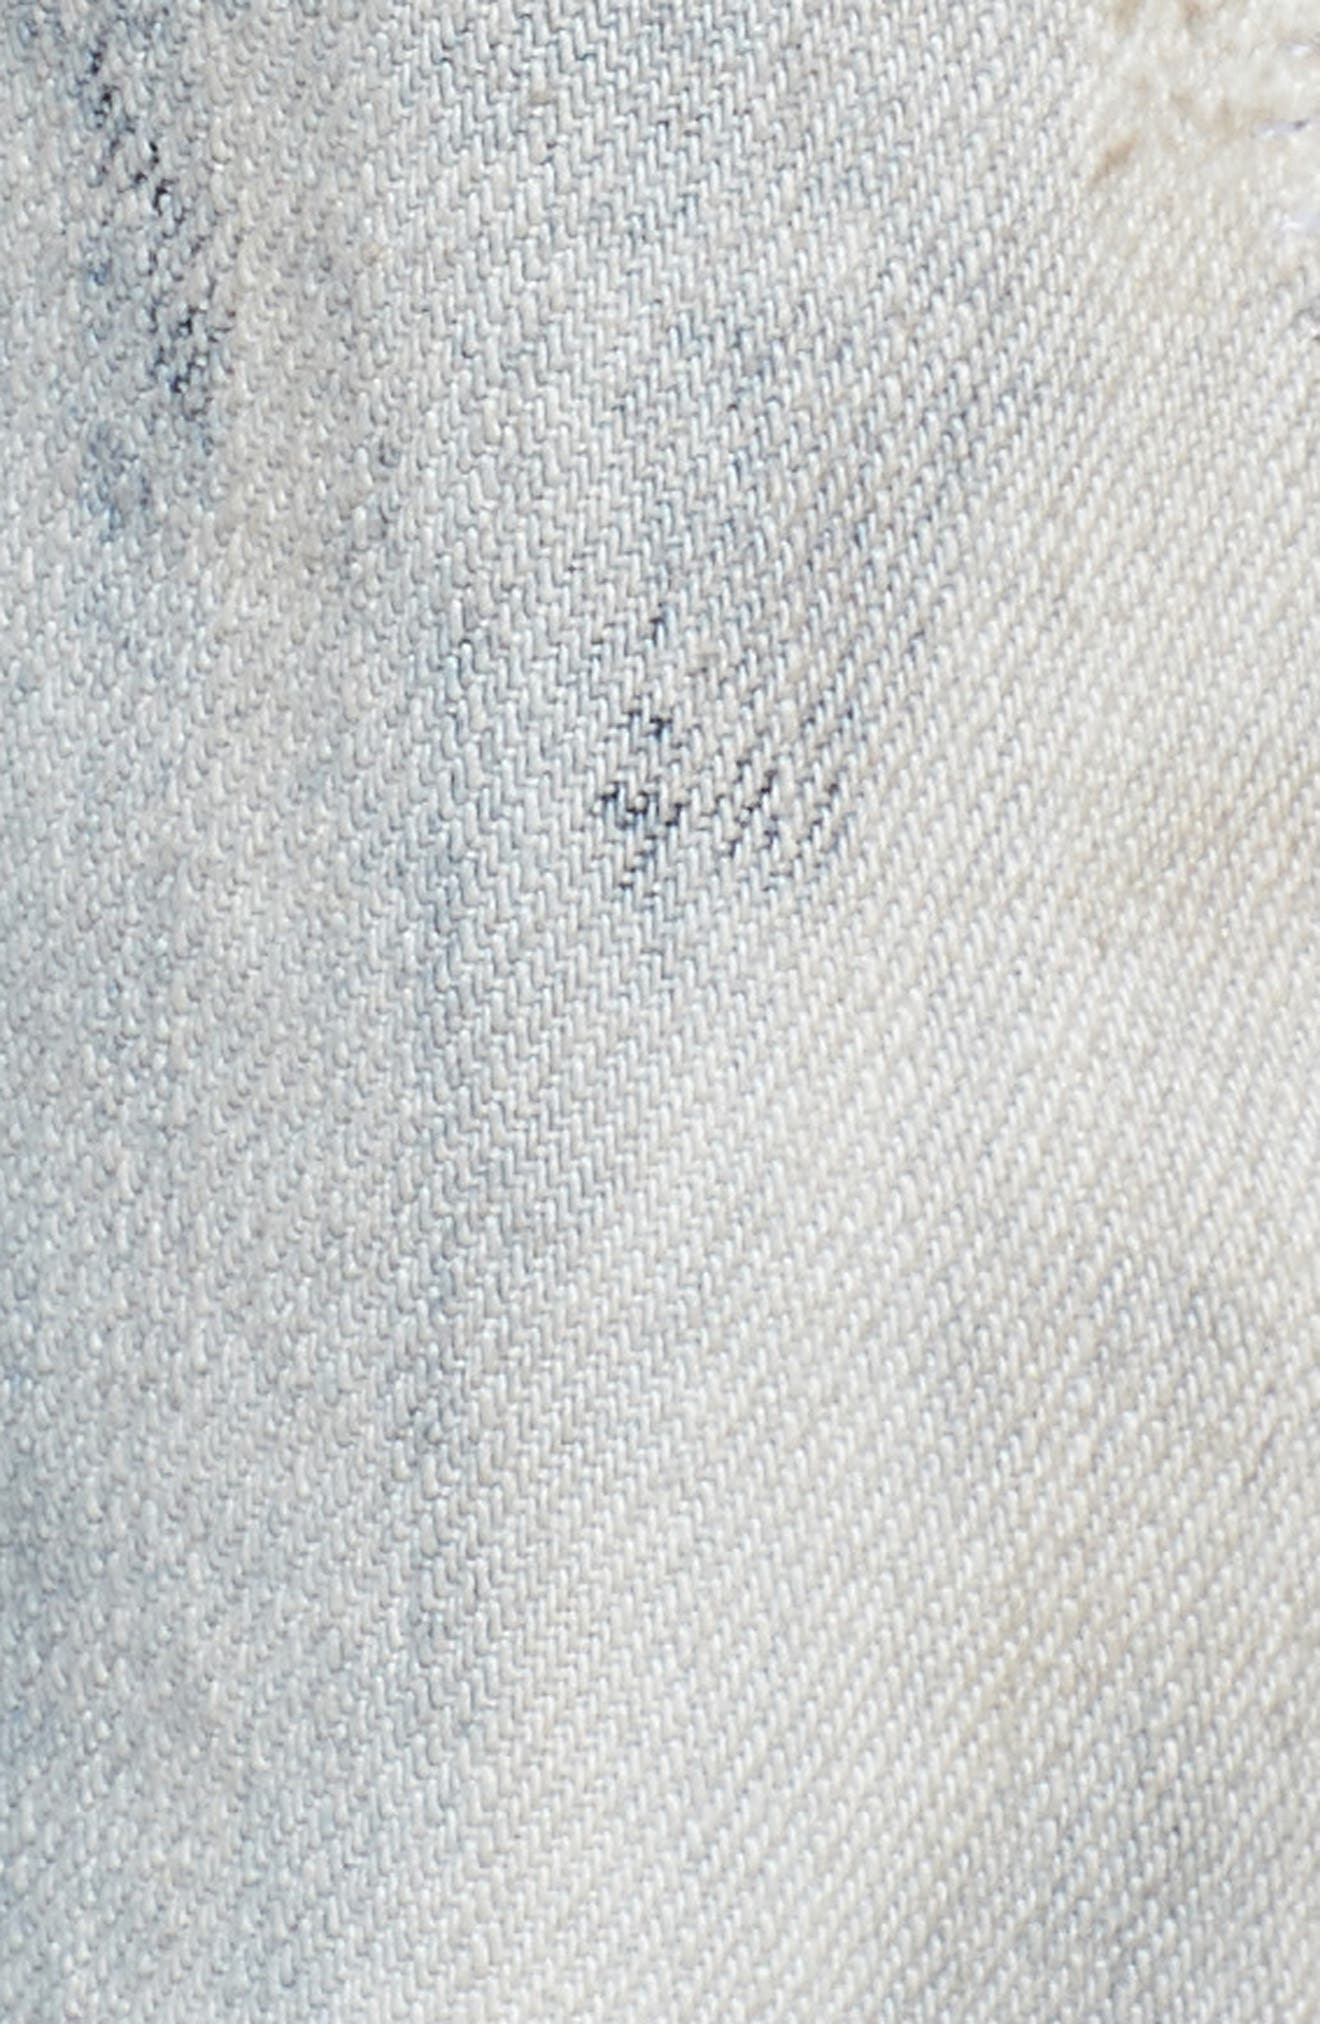 Demon Slim Straight Leg Jeans,                             Alternate thumbnail 5, color,                             COZY LIGHT WASH